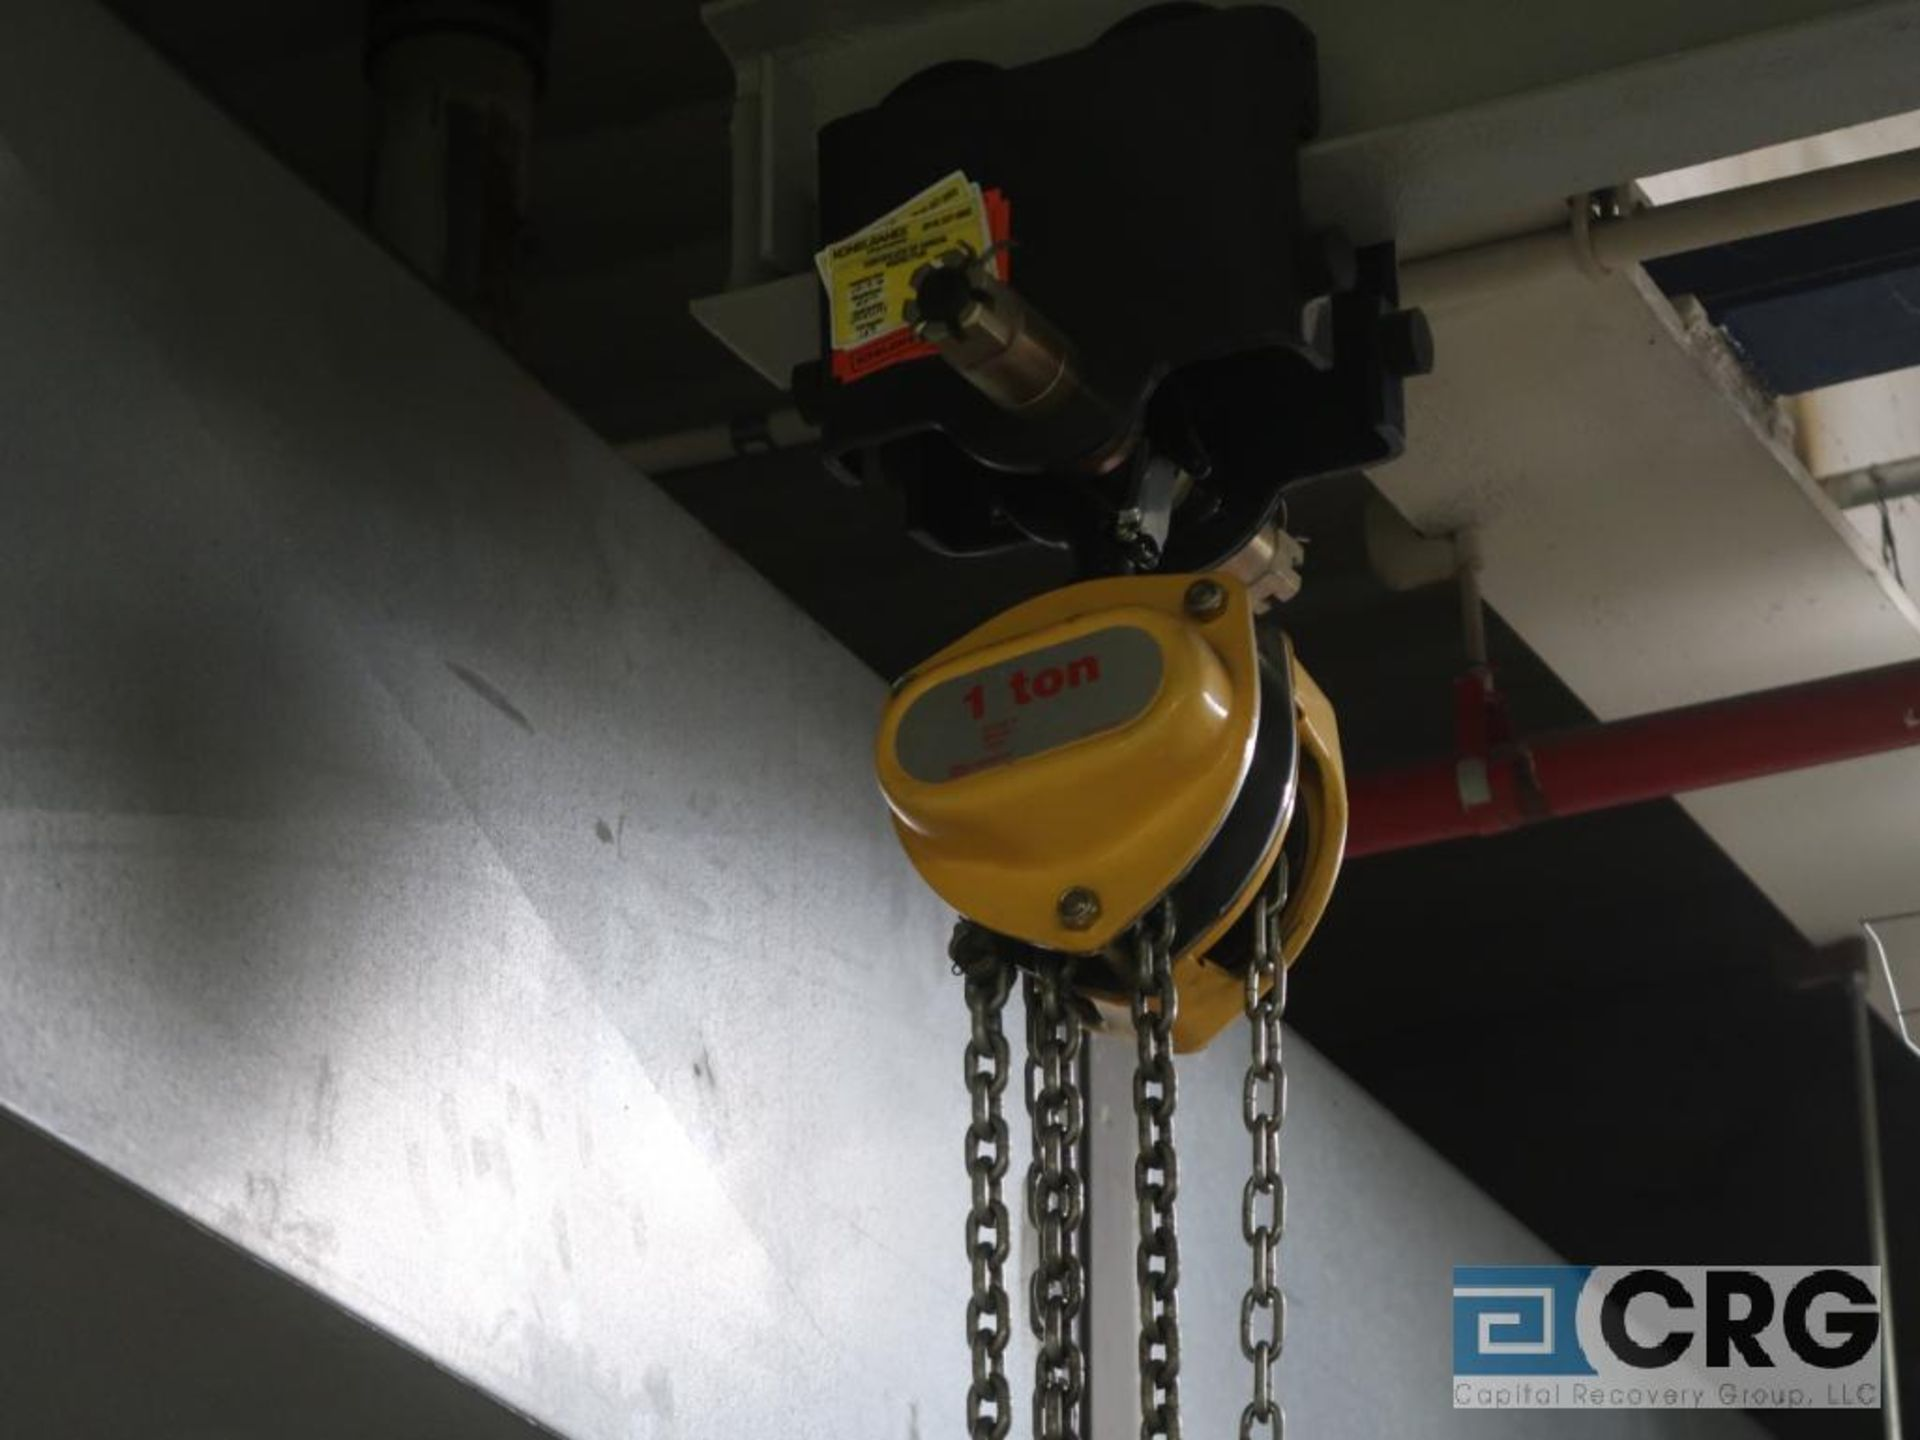 Lot of (3) chain hoists, 1/2 ton cap.-no rail (Stores Area) - Image 3 of 3